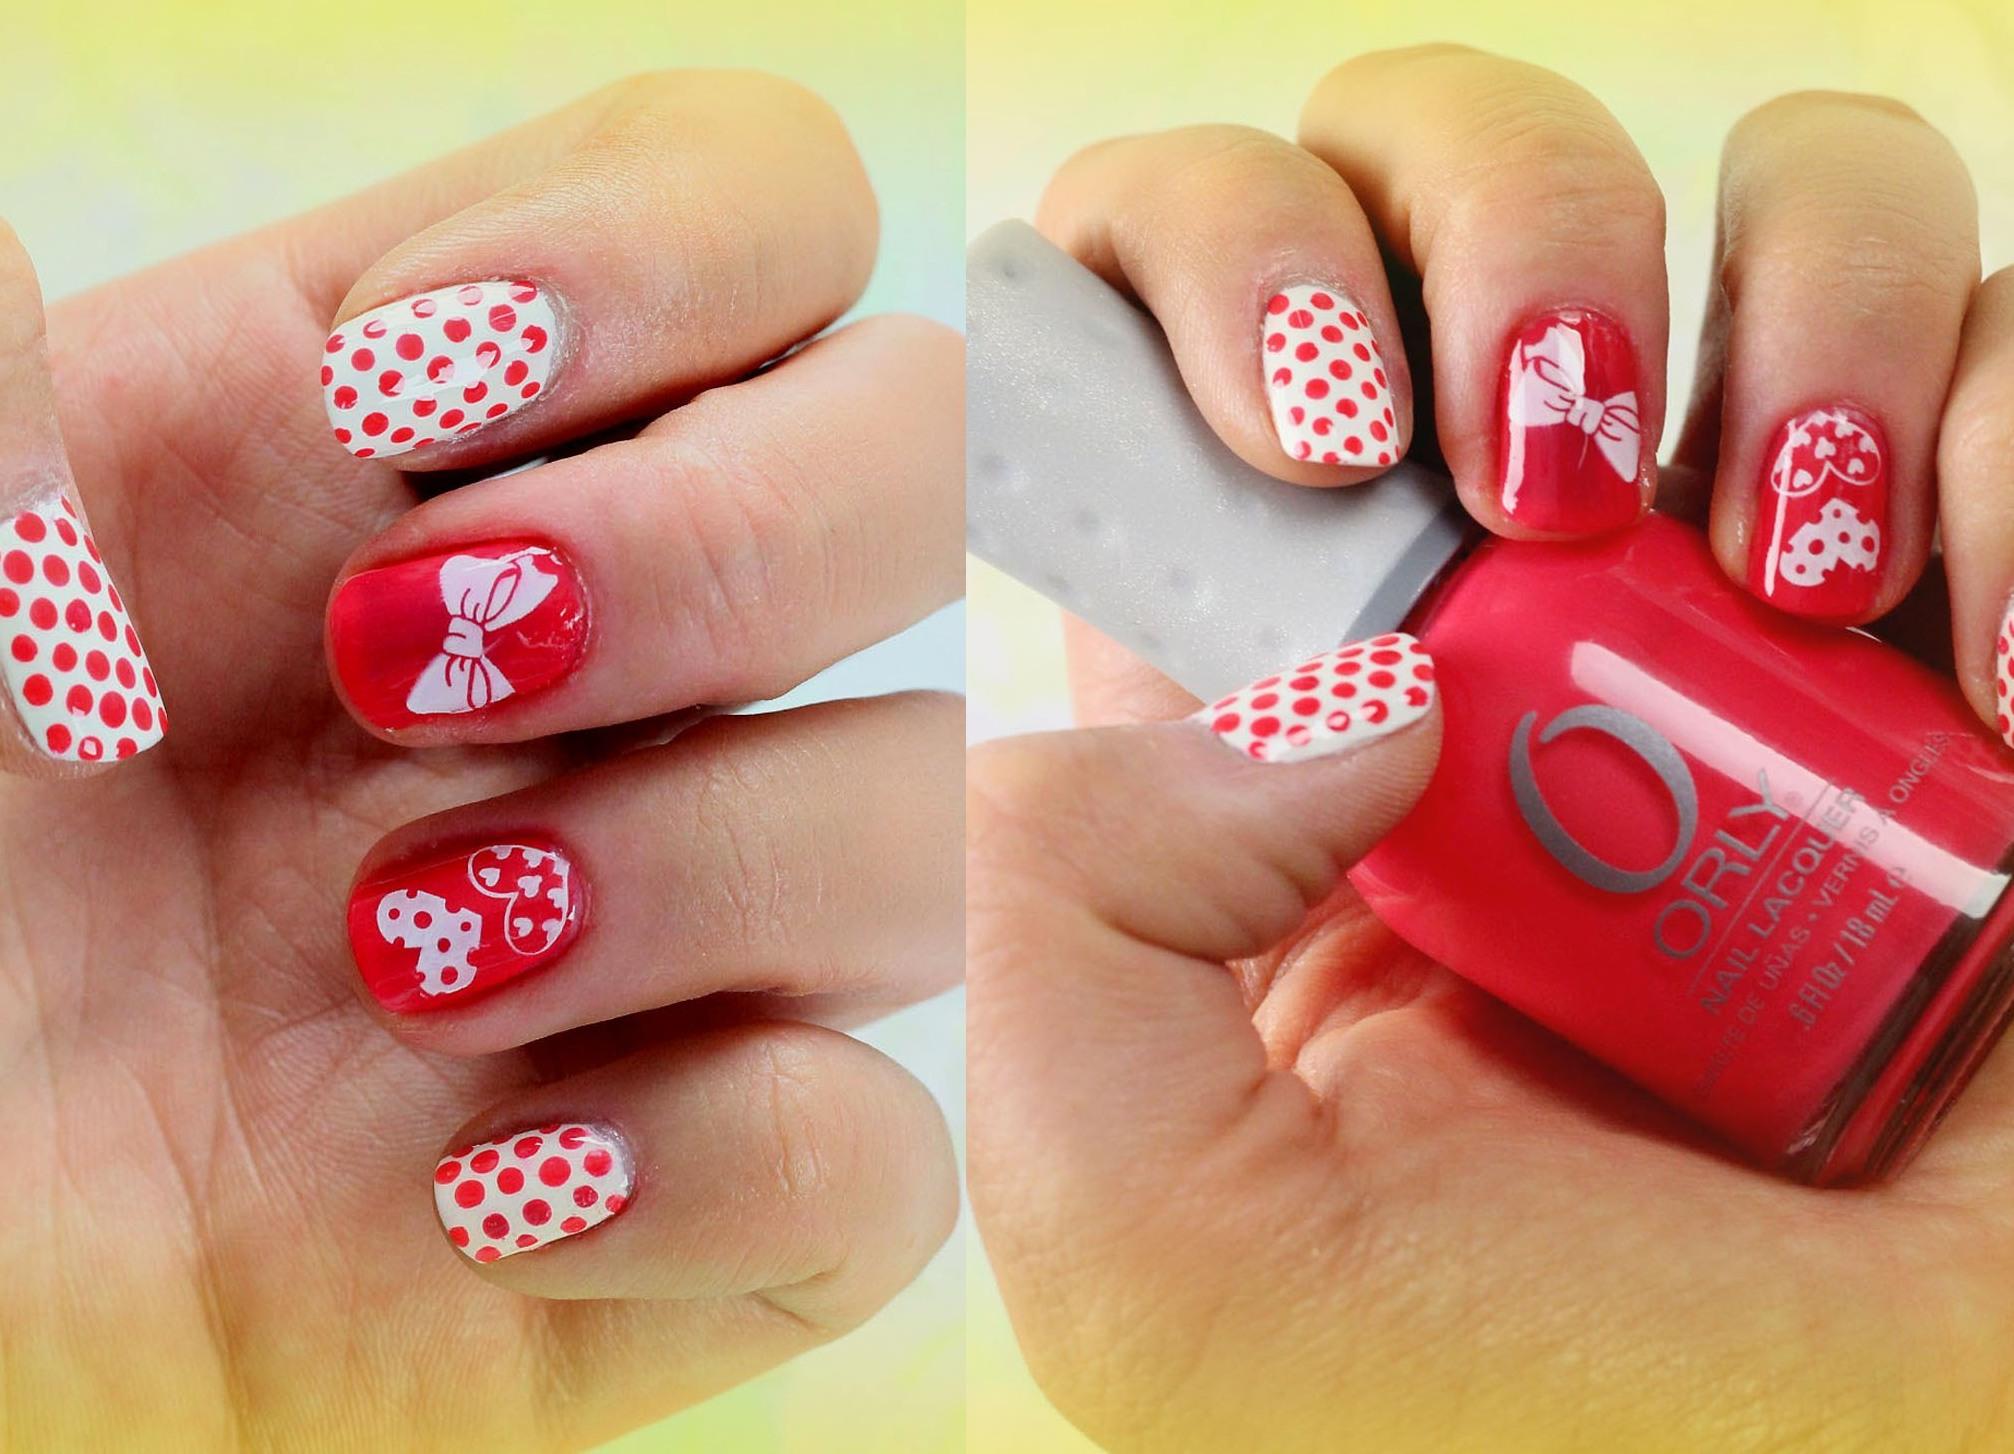 Идея маникюра на короткие ногти в домашних условиях фото